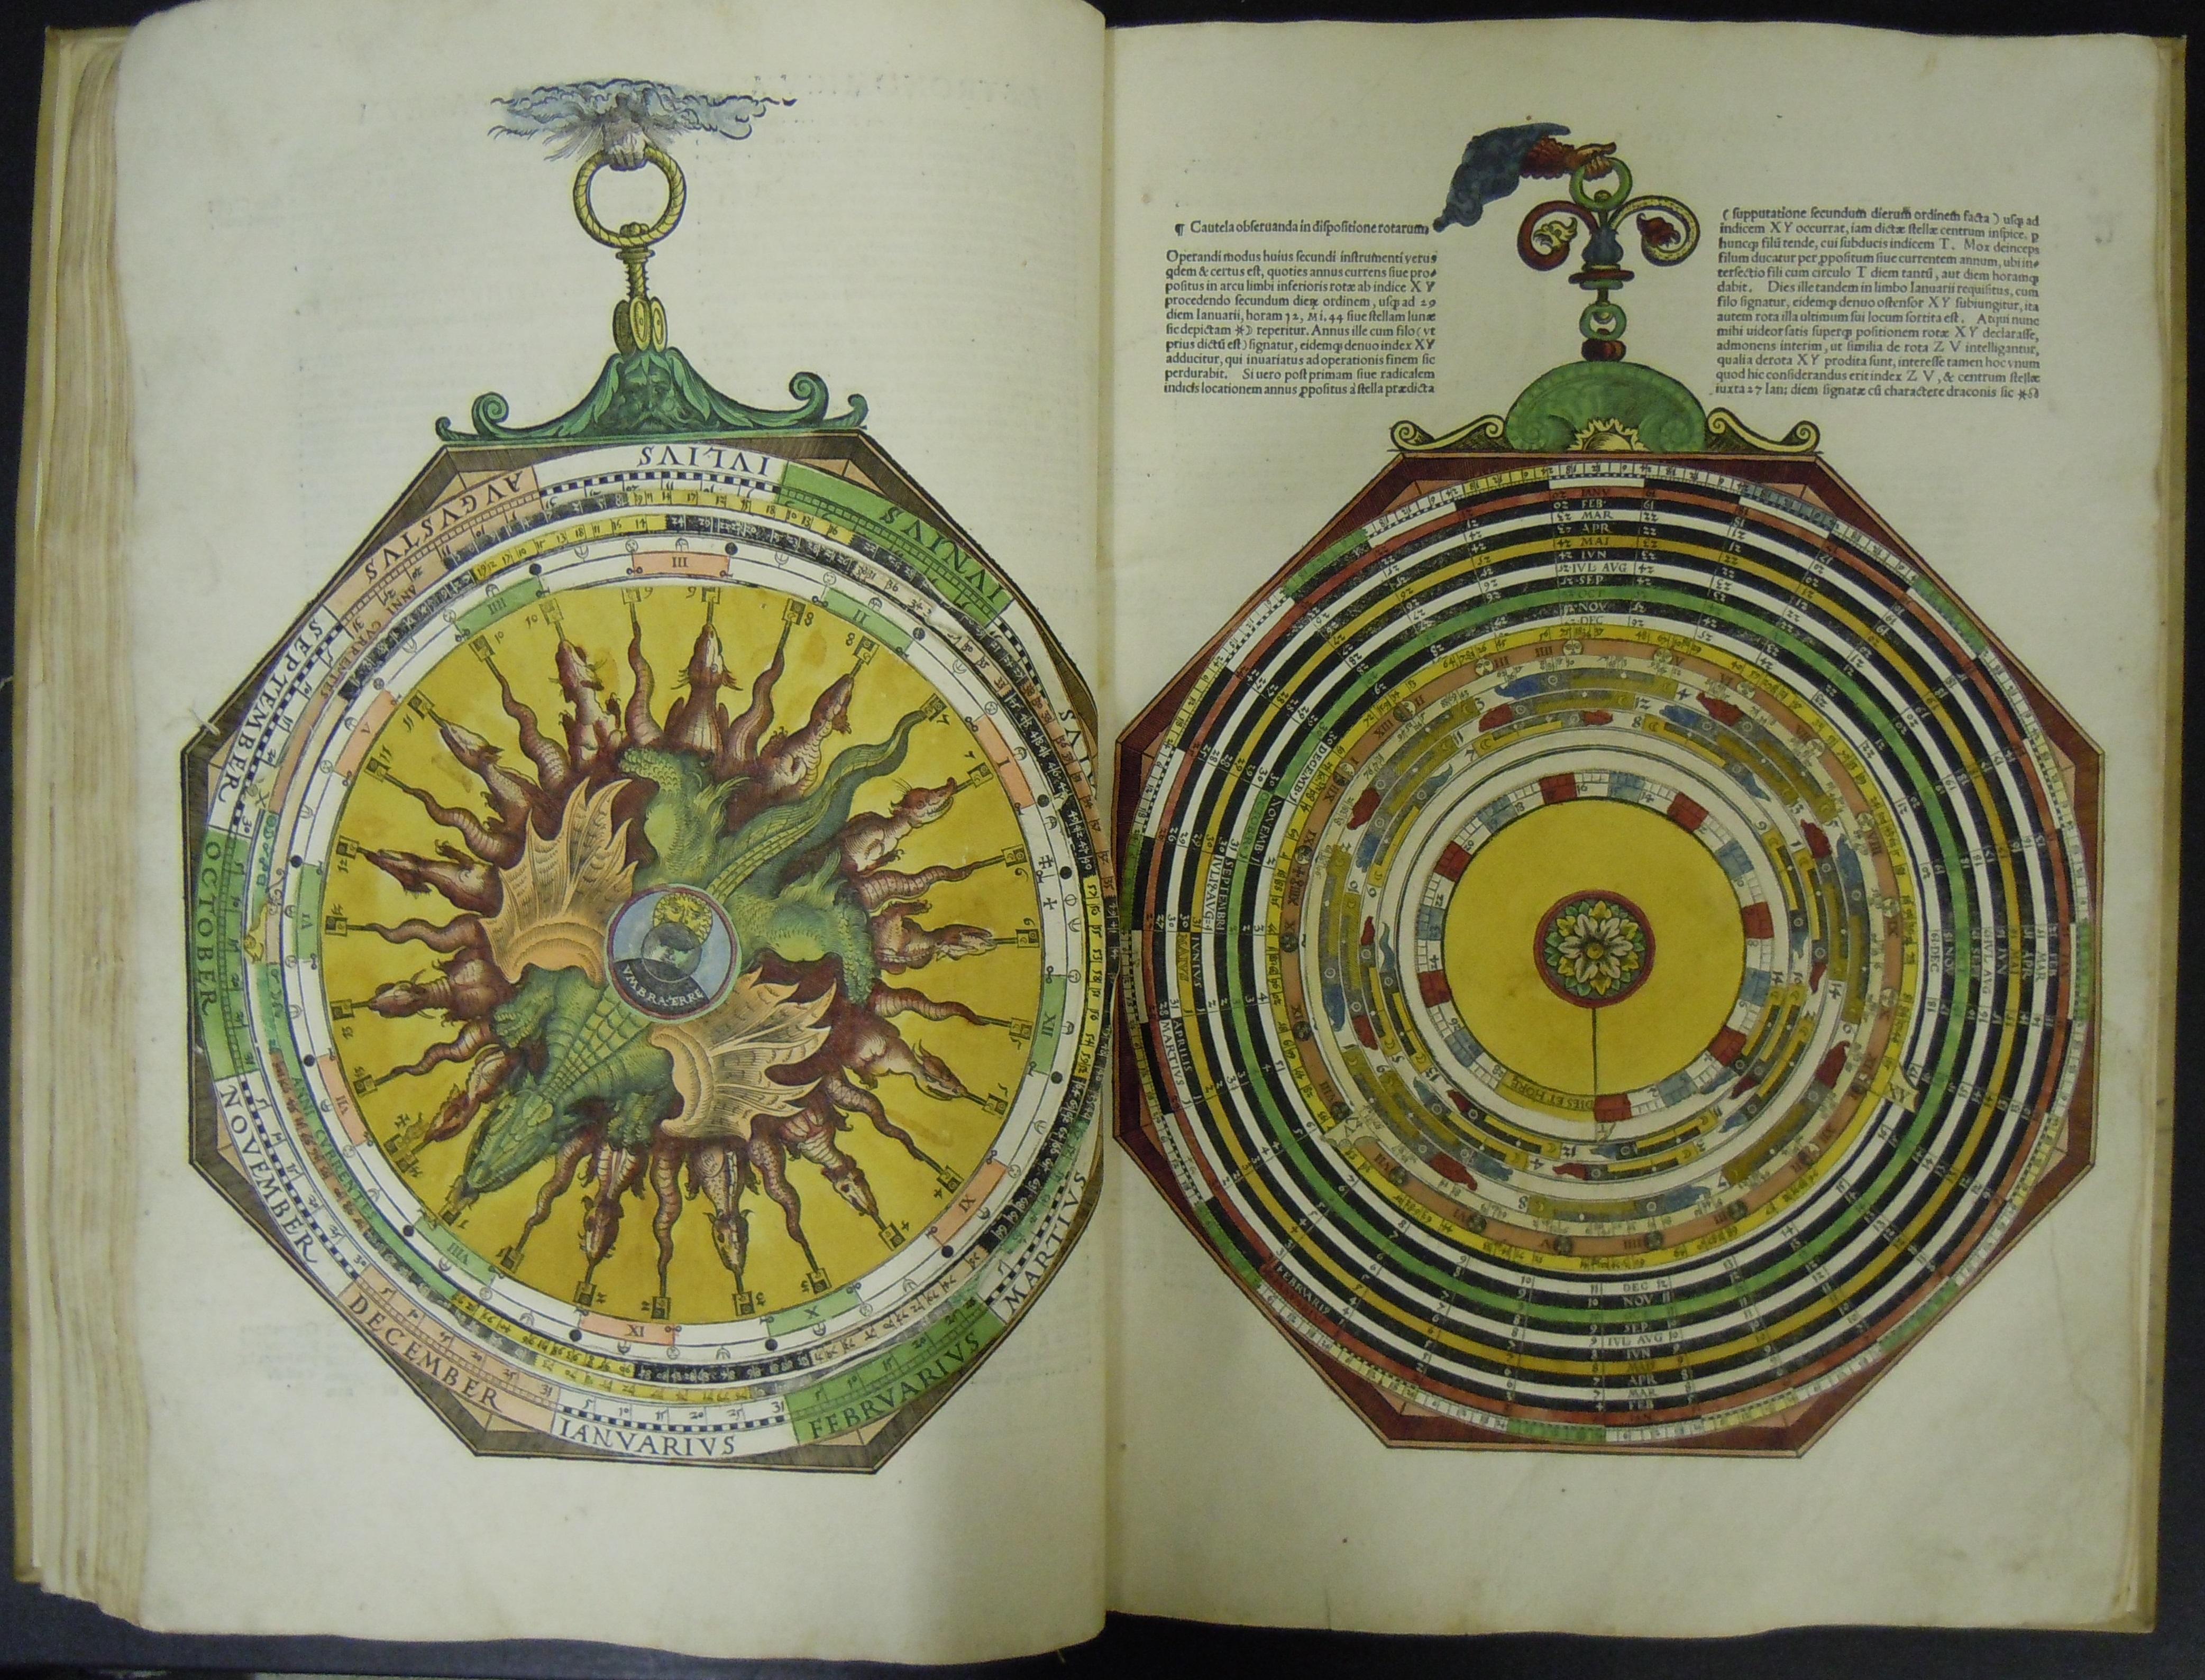 BT1.70.2, GIIIv-GIIIIr, Peter Apian's Astronomicum Caesareum, 1540